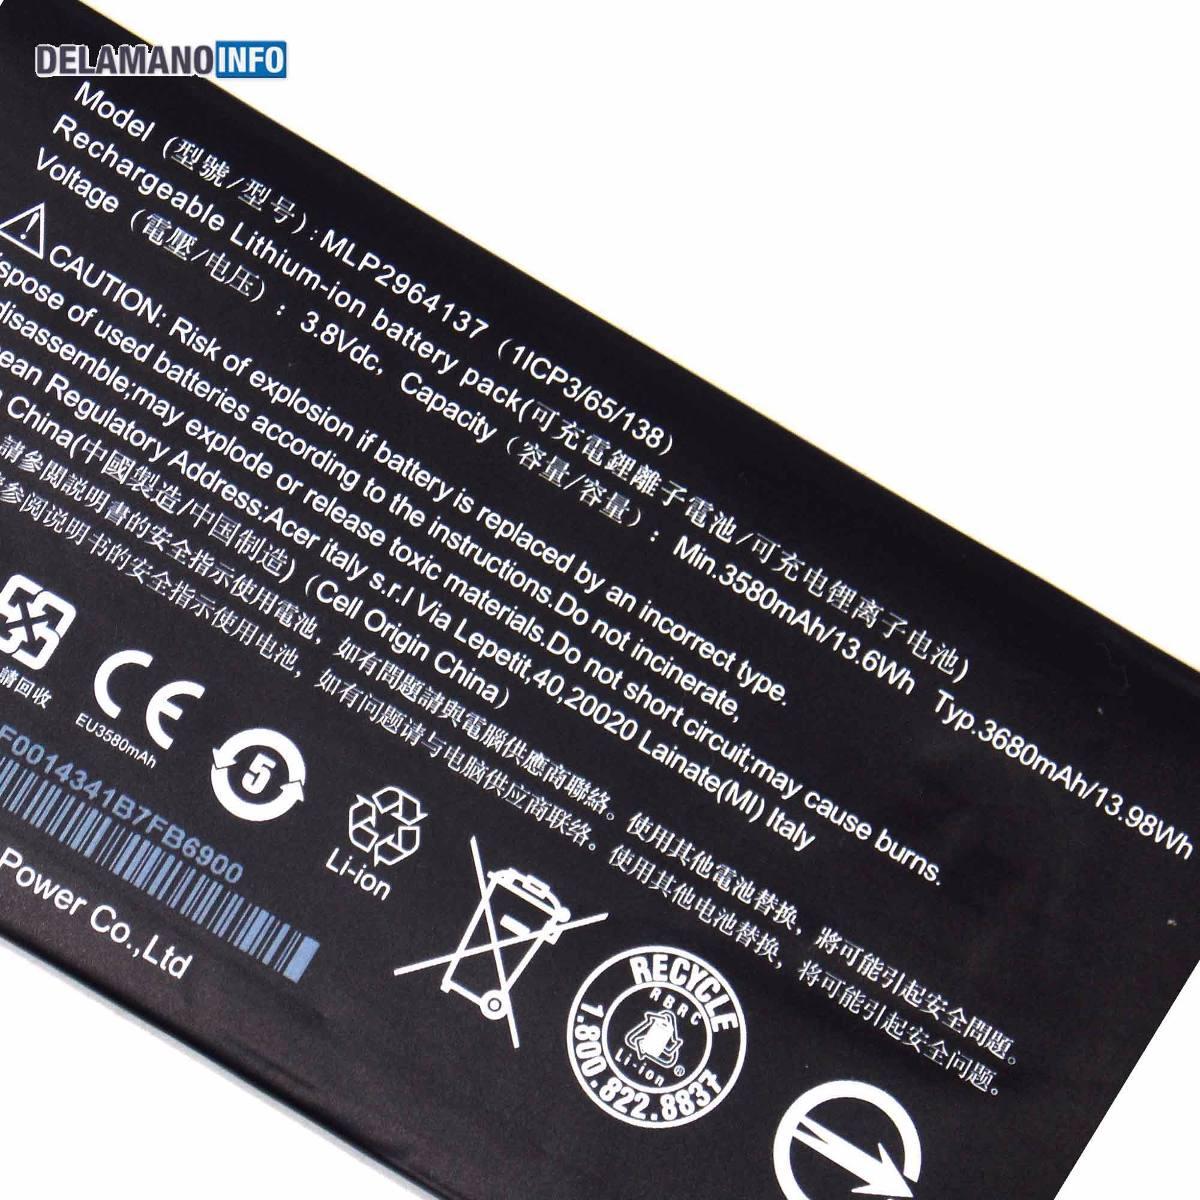 Bateria Tablet Acer Iconia One 7 B1 730 19e2 6718